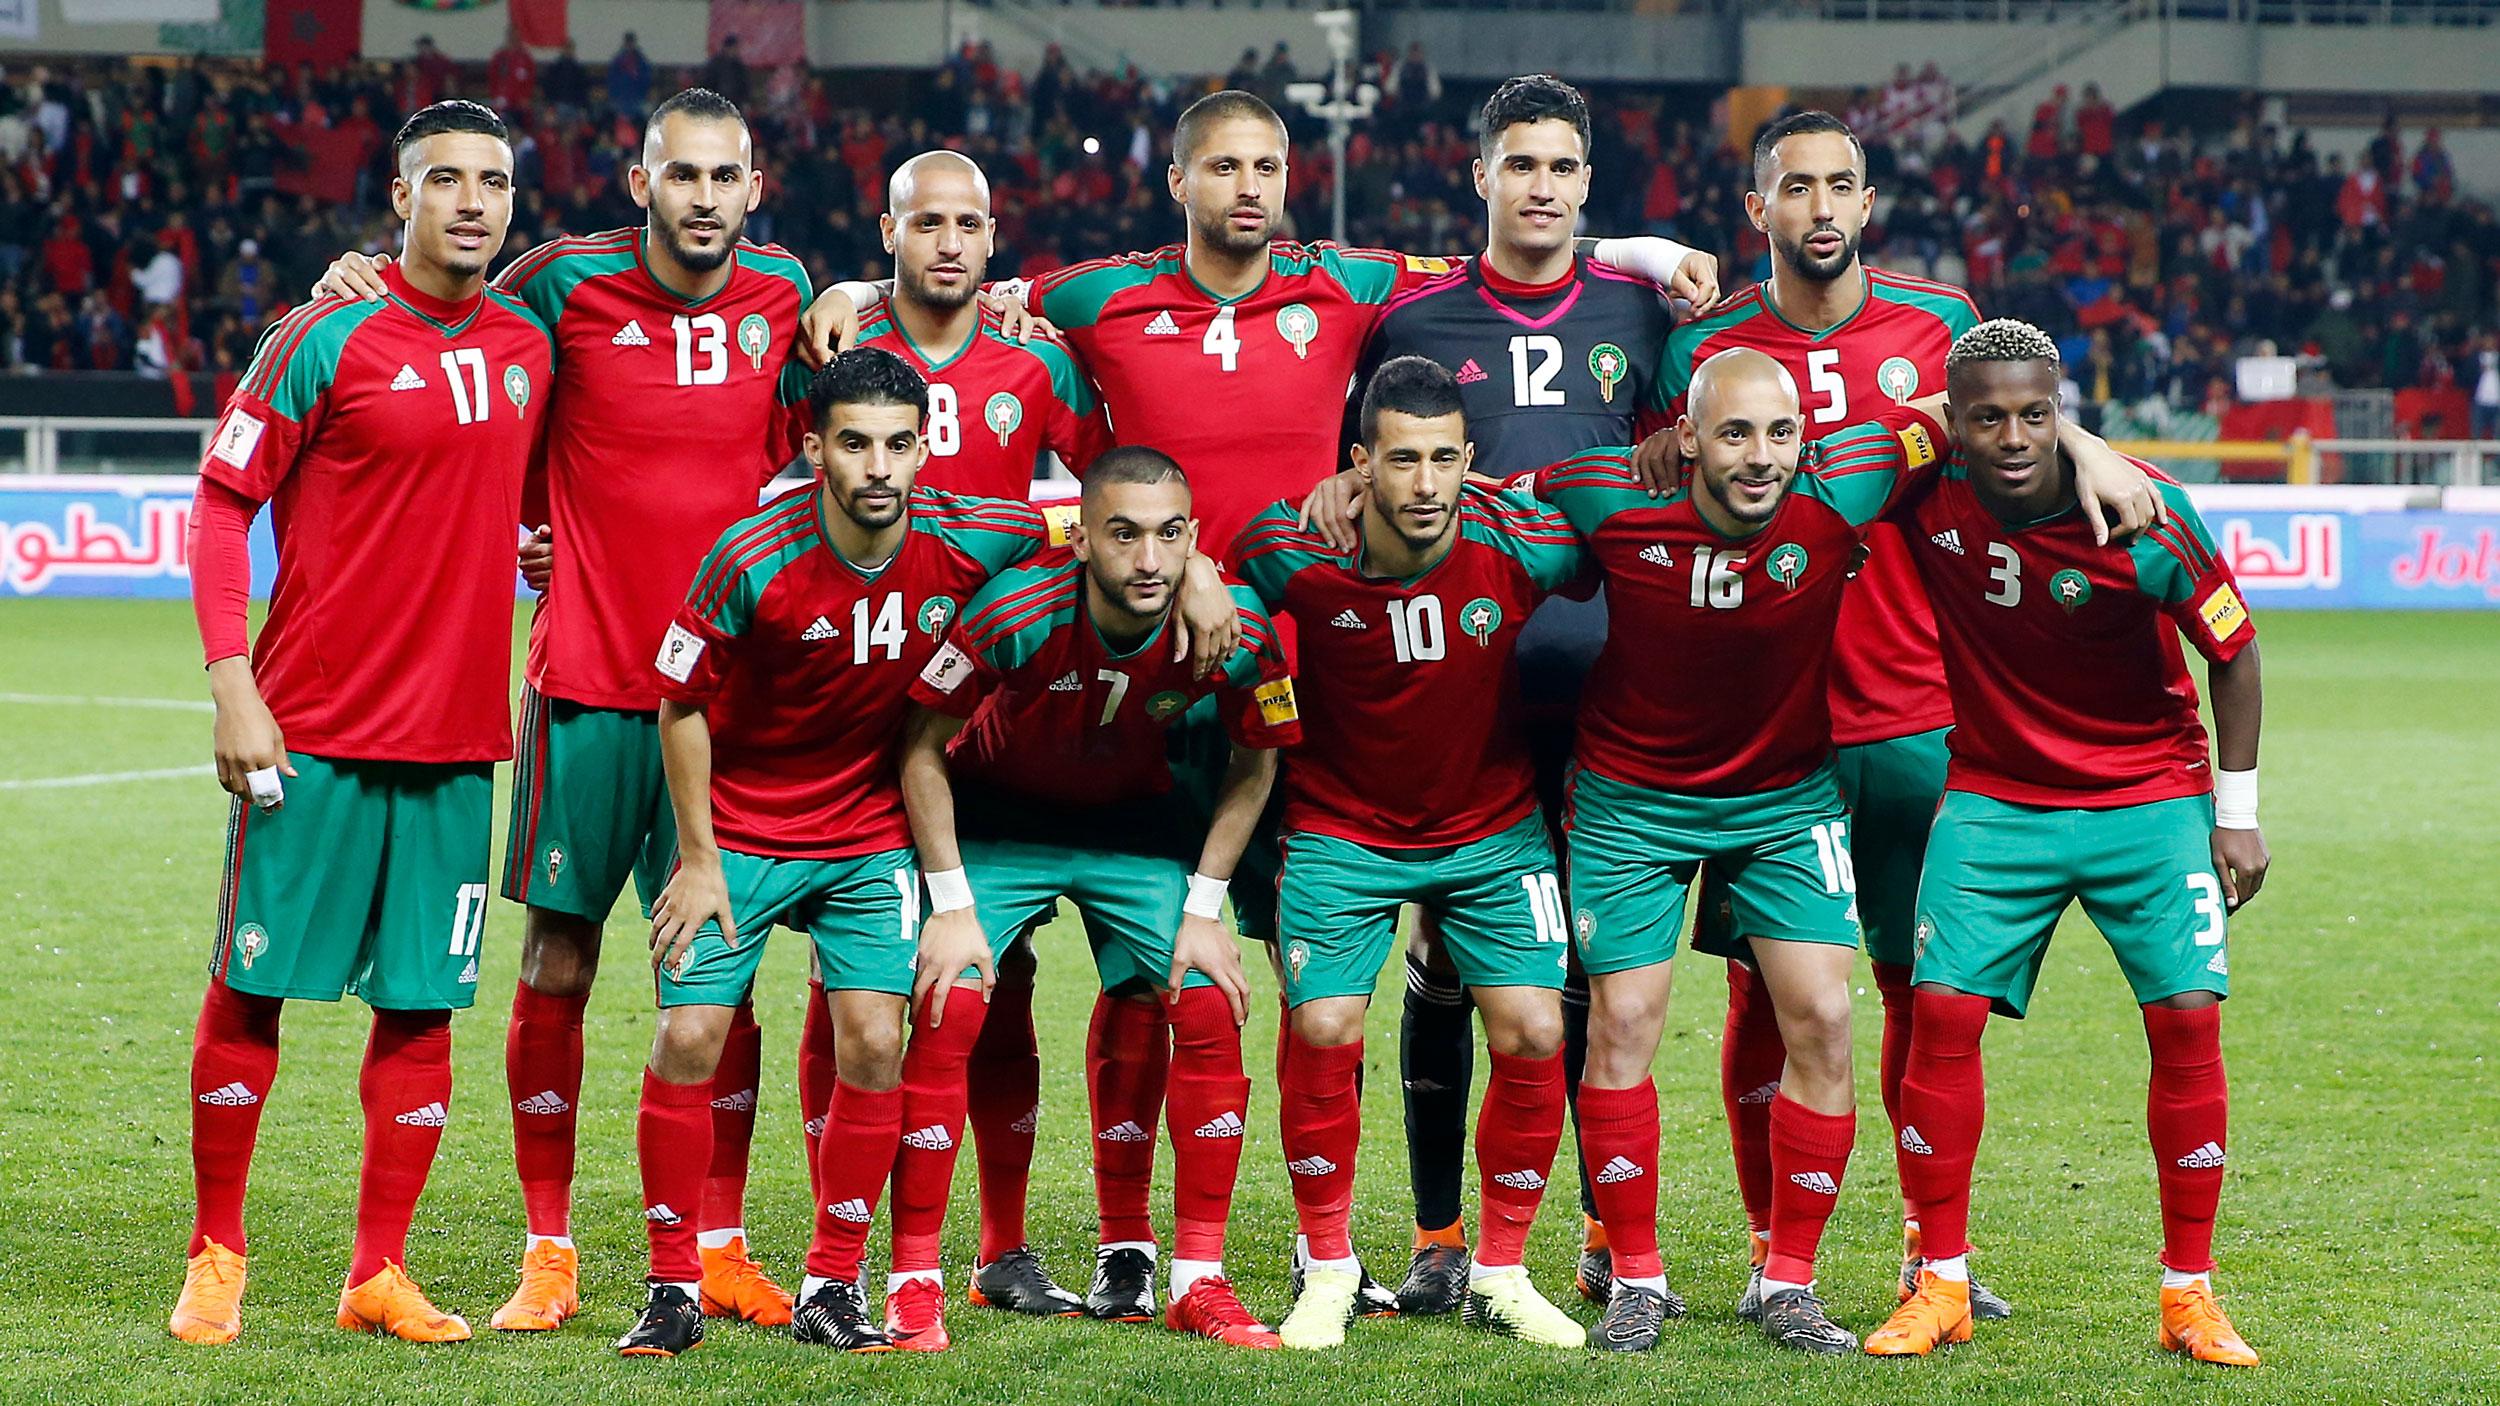 Morocco World Cup 2018 team